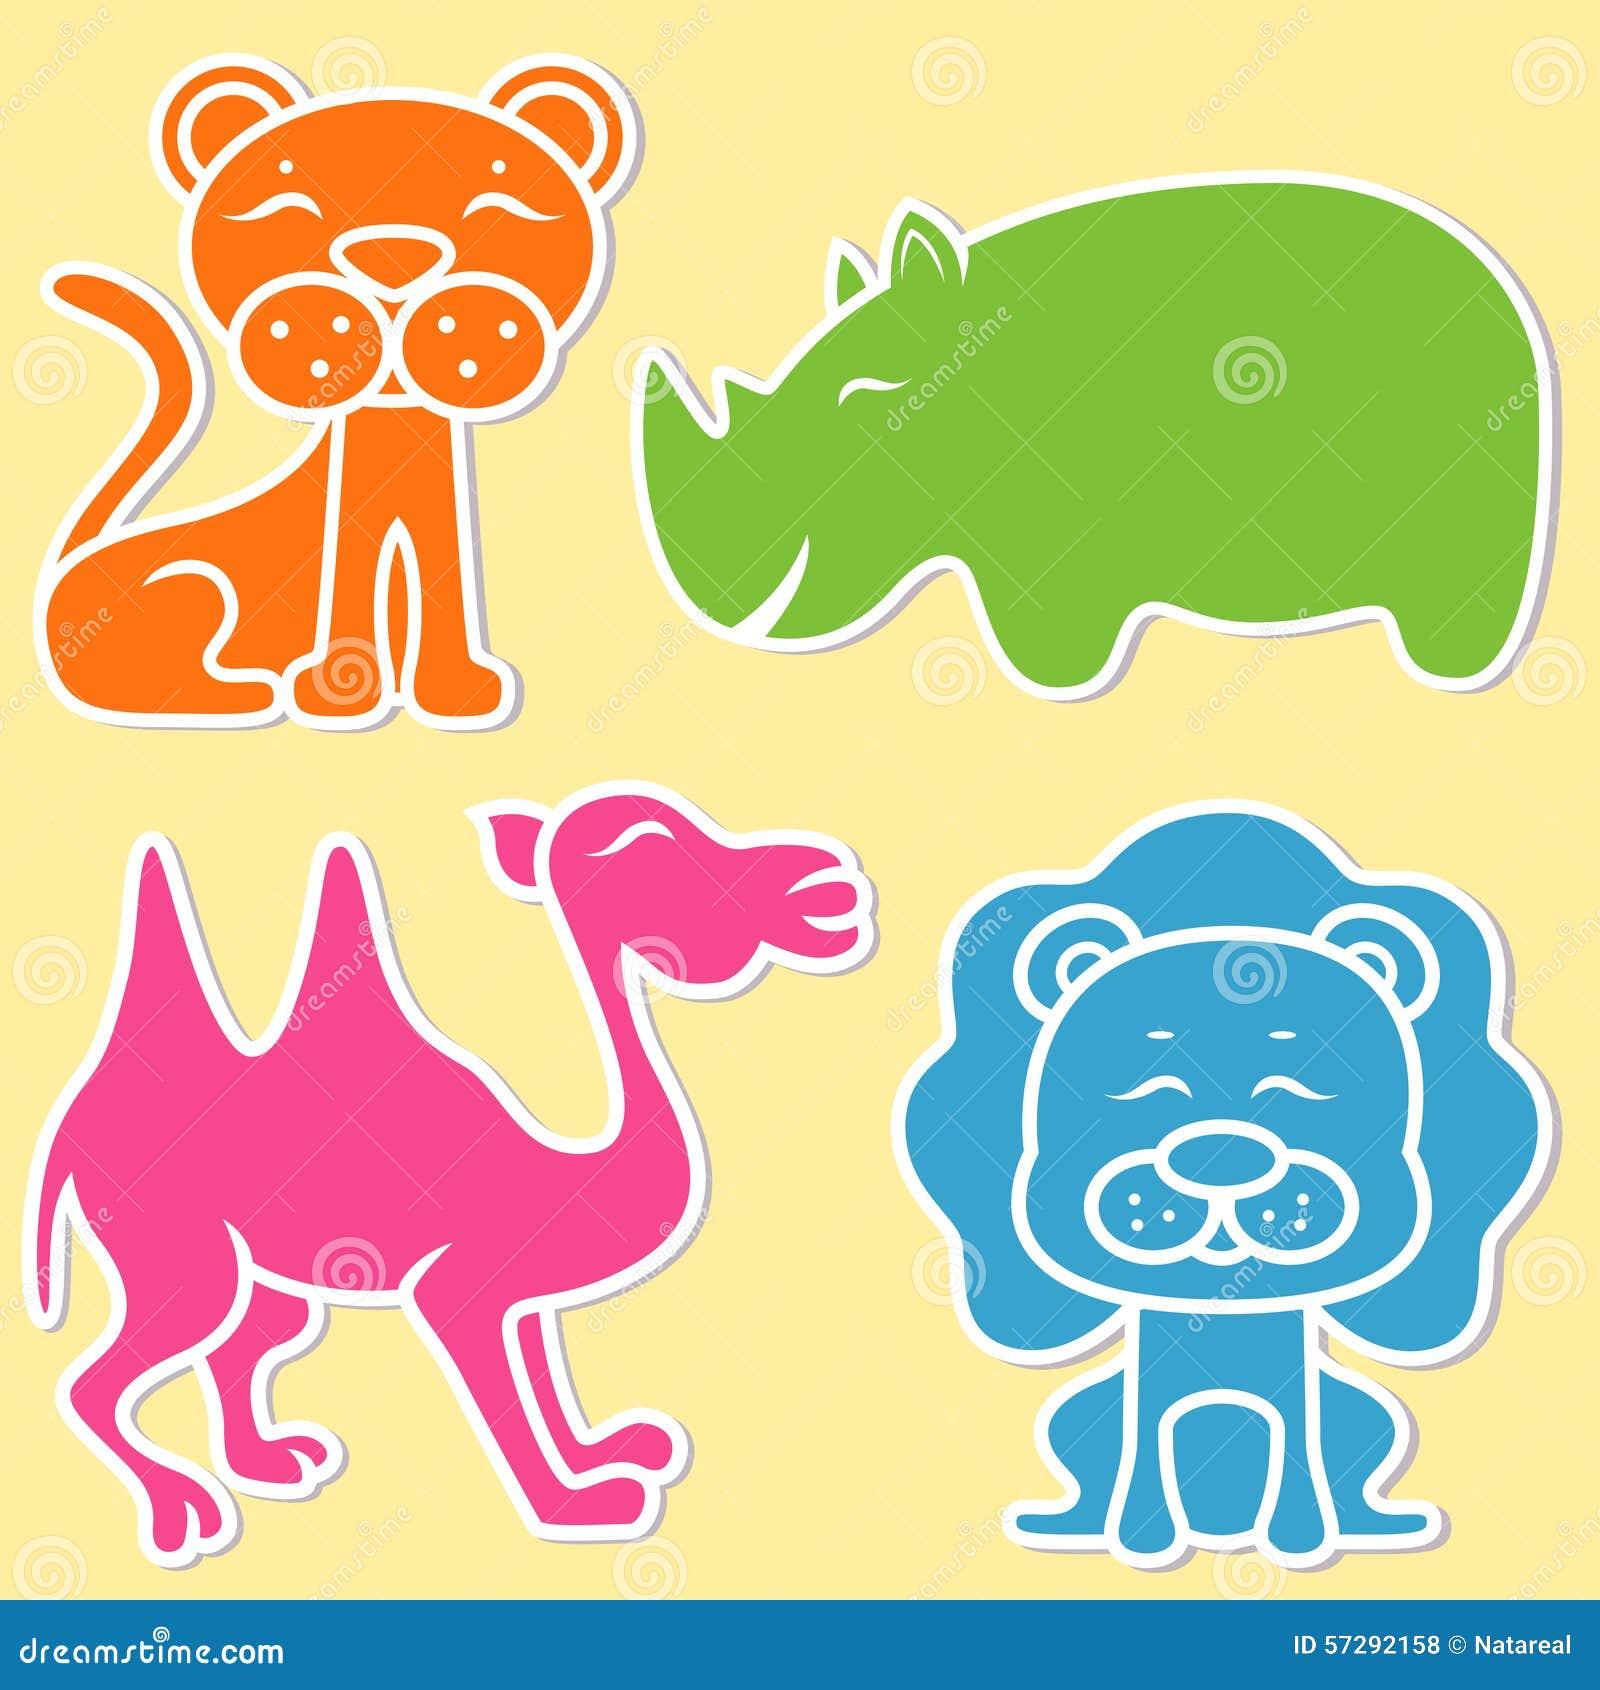 Cute Lion Mascot Cartoon Illustration Animal Wildlife Icon Concept:  Lion , Lioness, Rhino And Camel Stock Vector